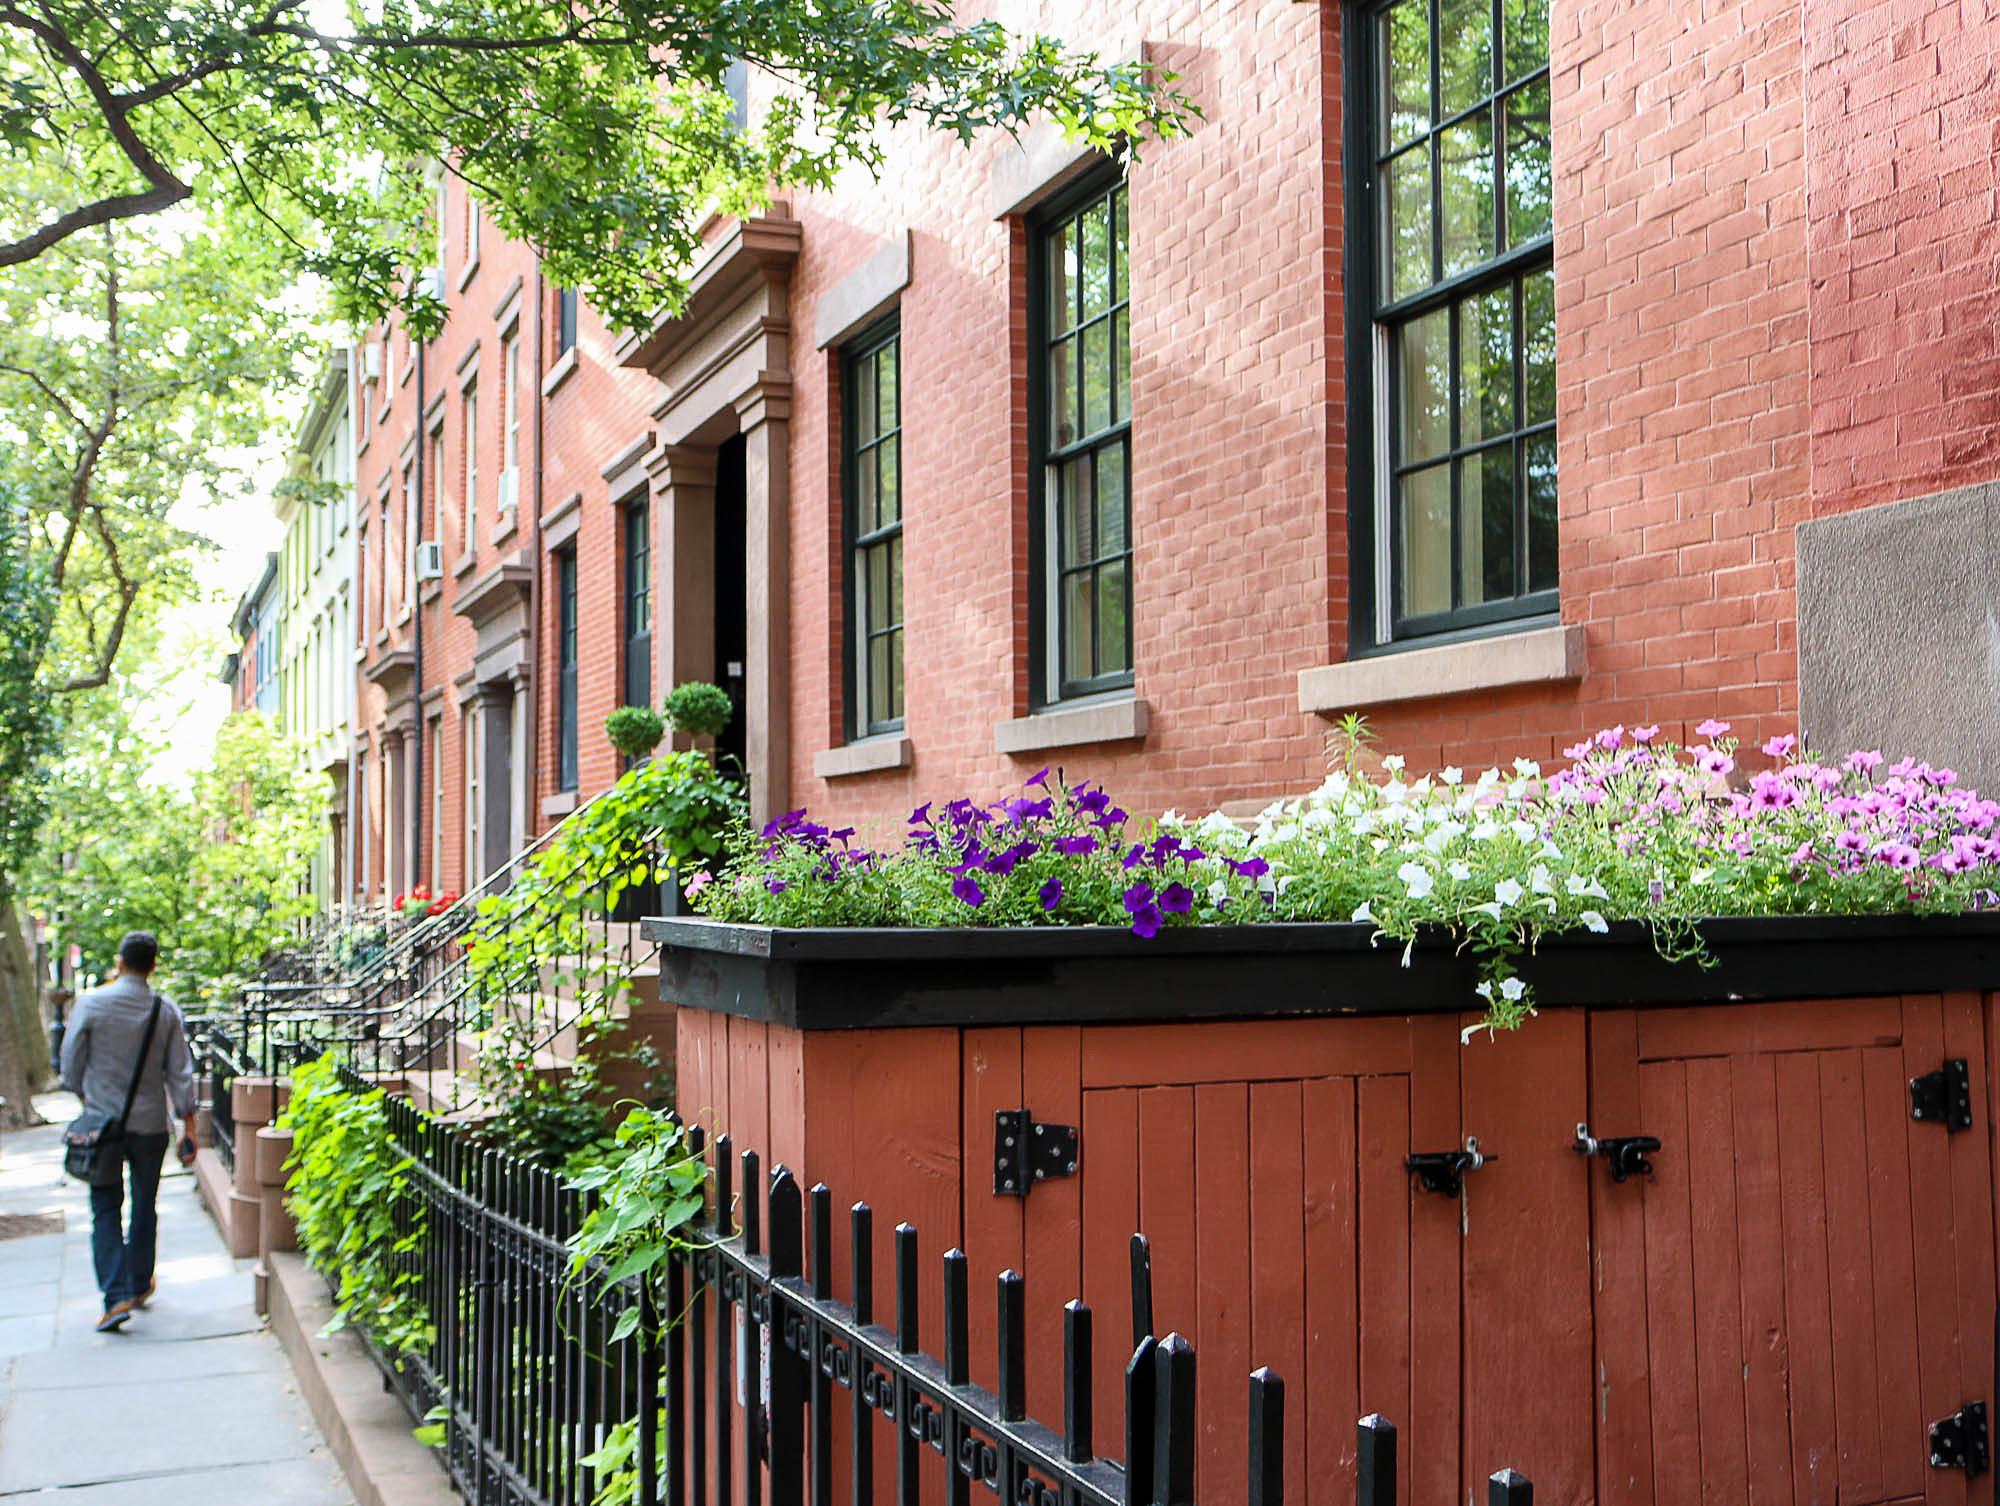 Outdoor Garbage Bins: Ideas for Urban Front Yards | Brownstoner